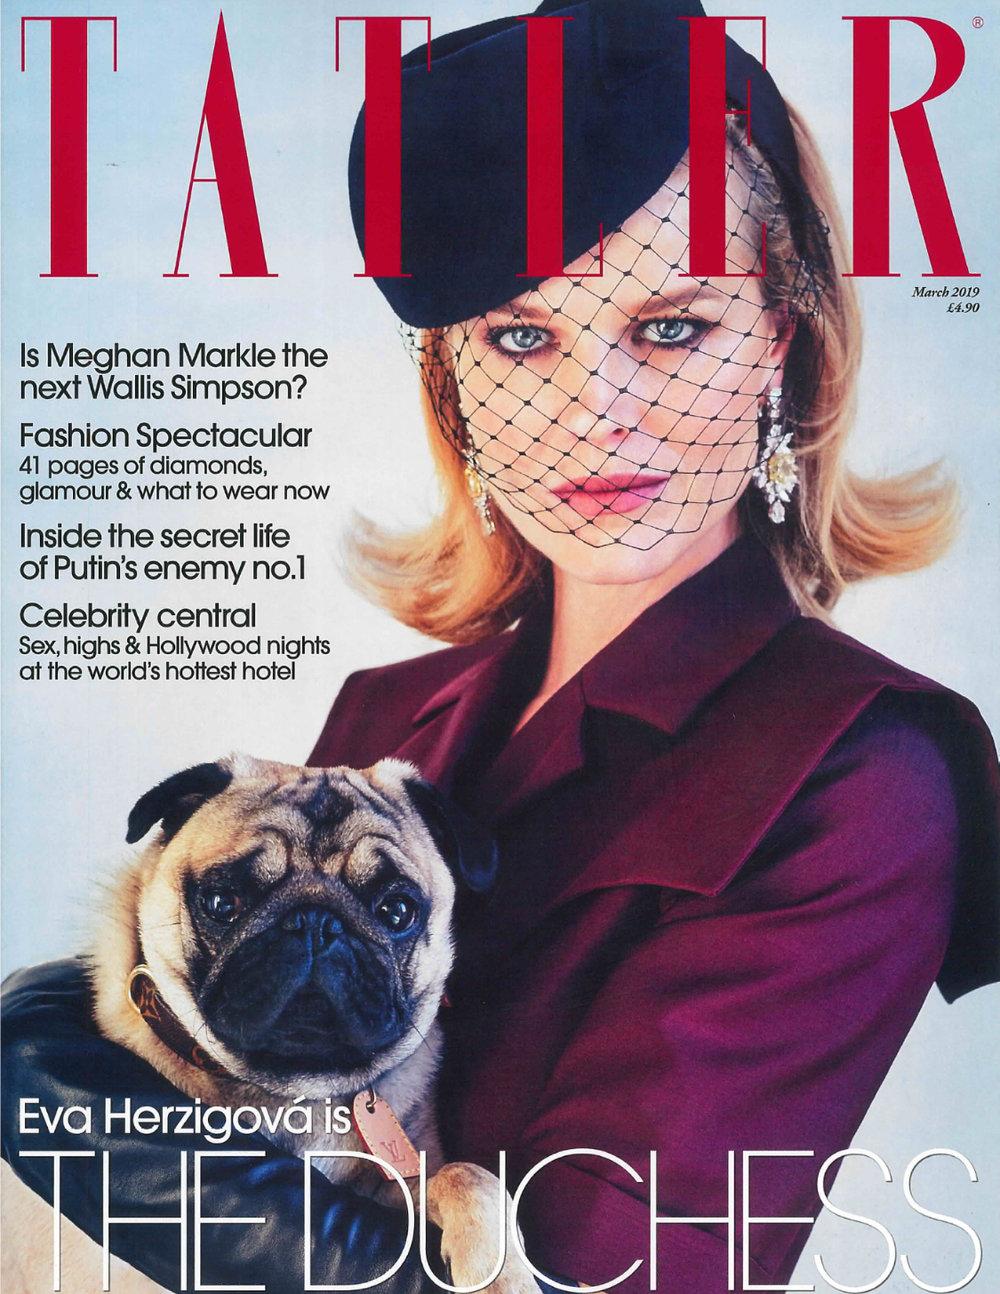 Tatler Magazine- March 2019